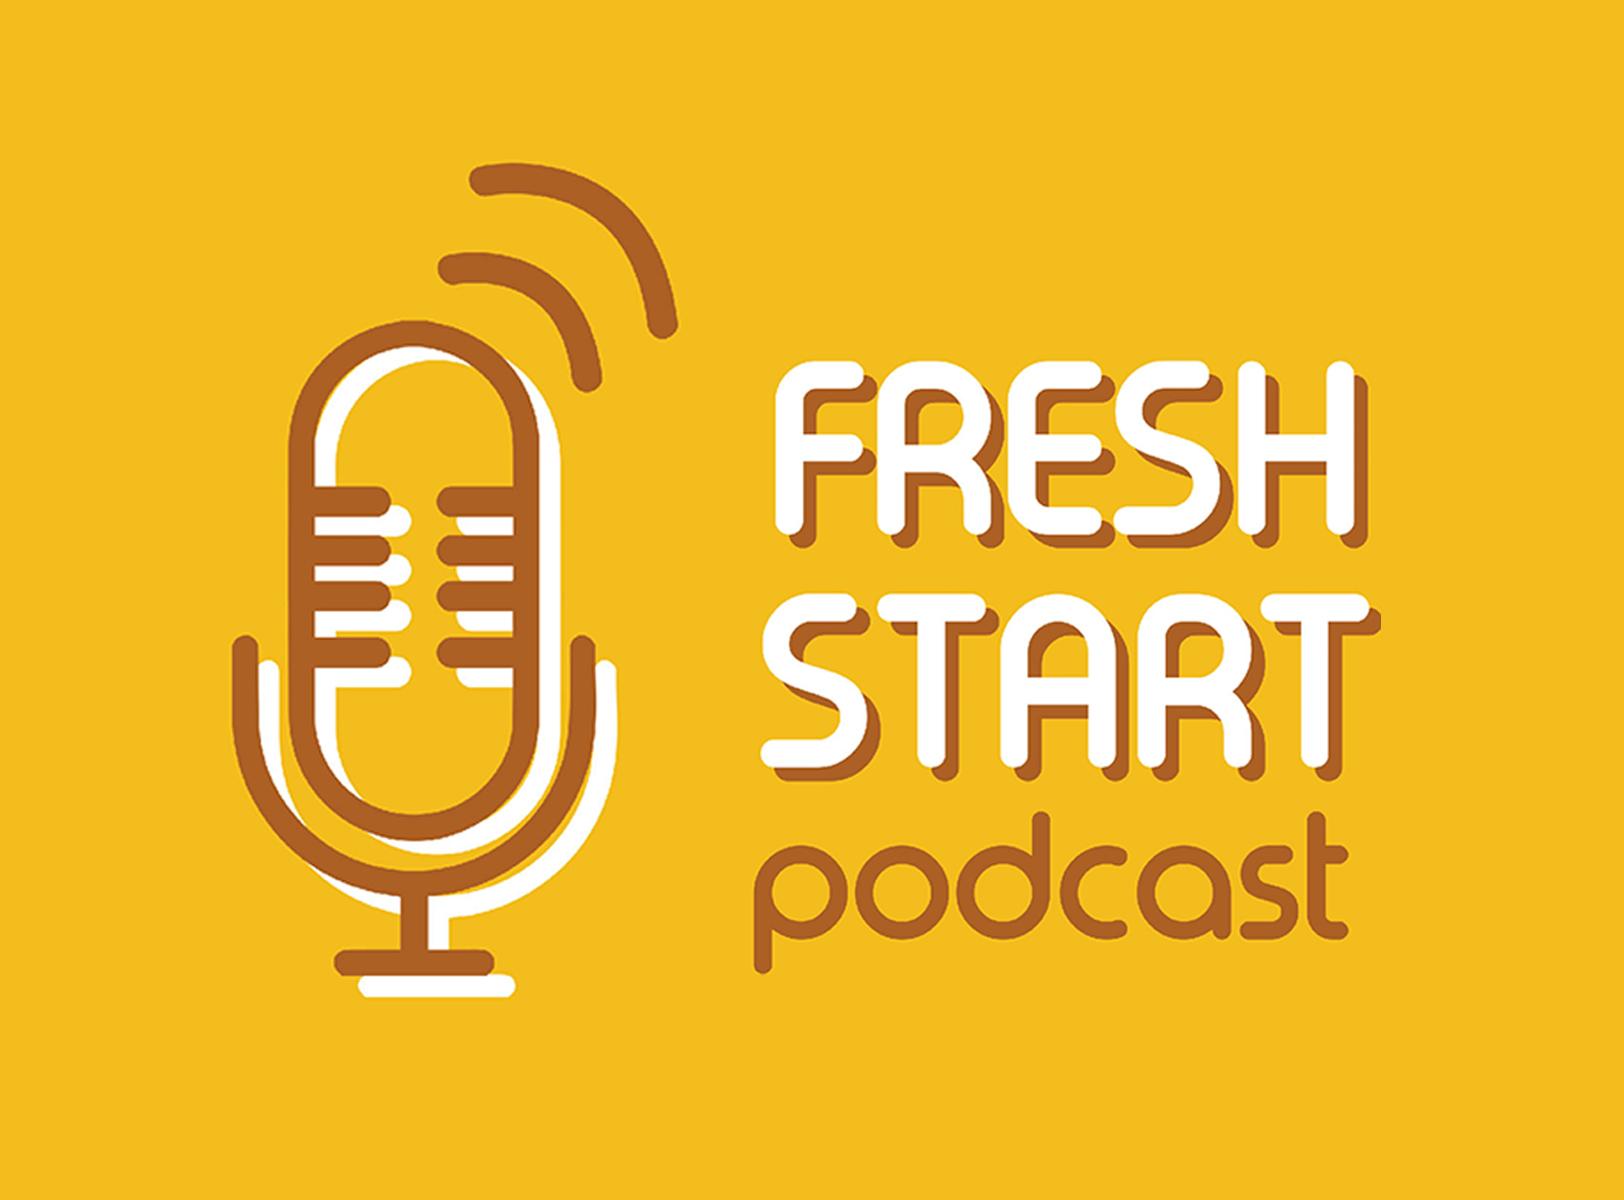 Fresh Start: Podcast News (9/12/2019 Thu.)